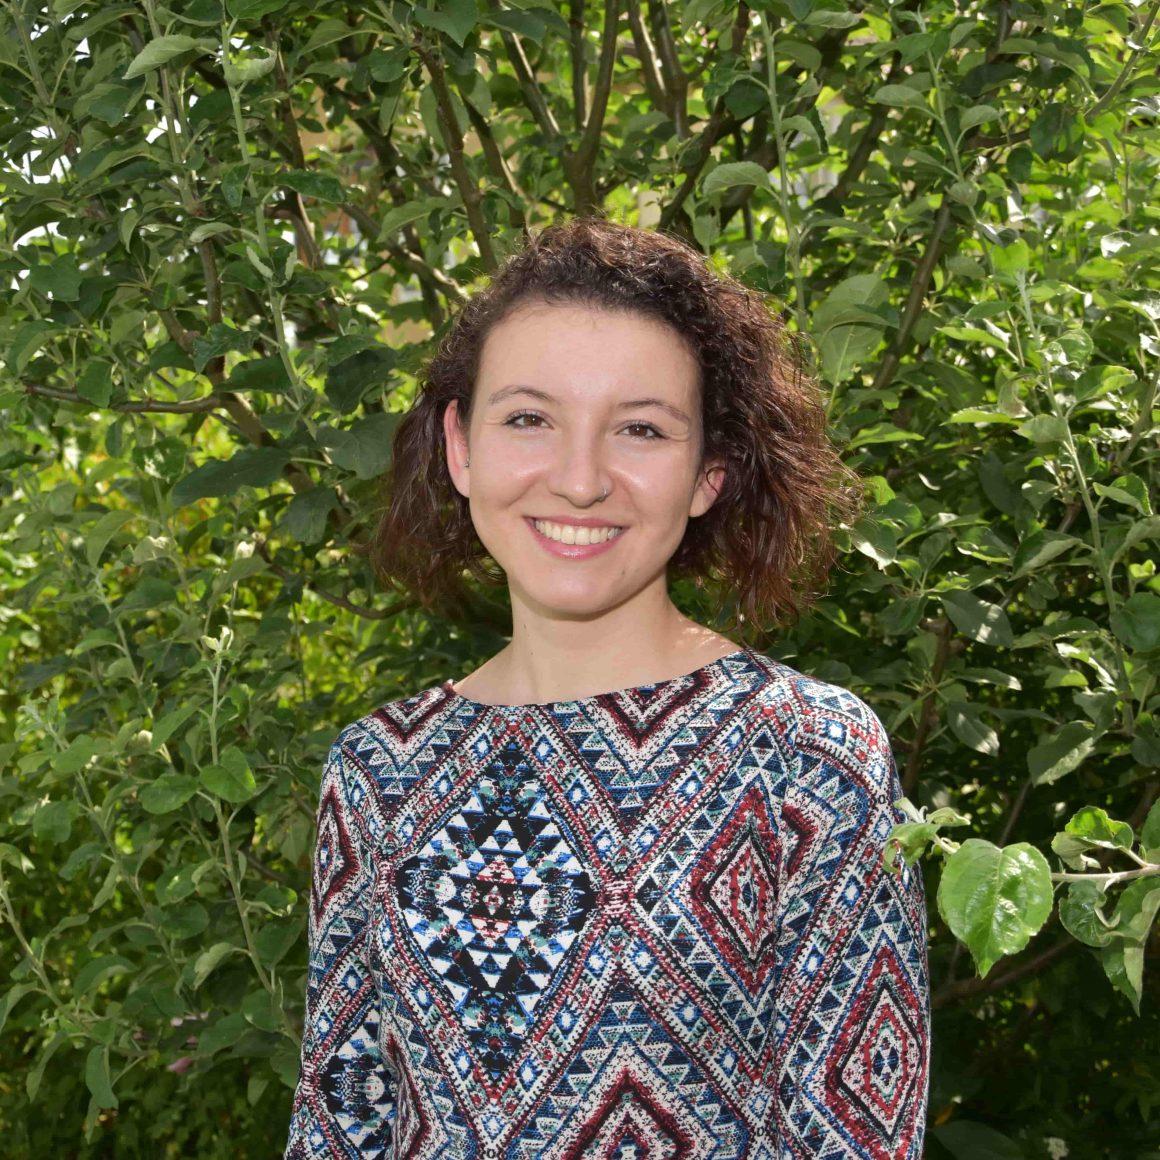 Magdalena Doppelbauer